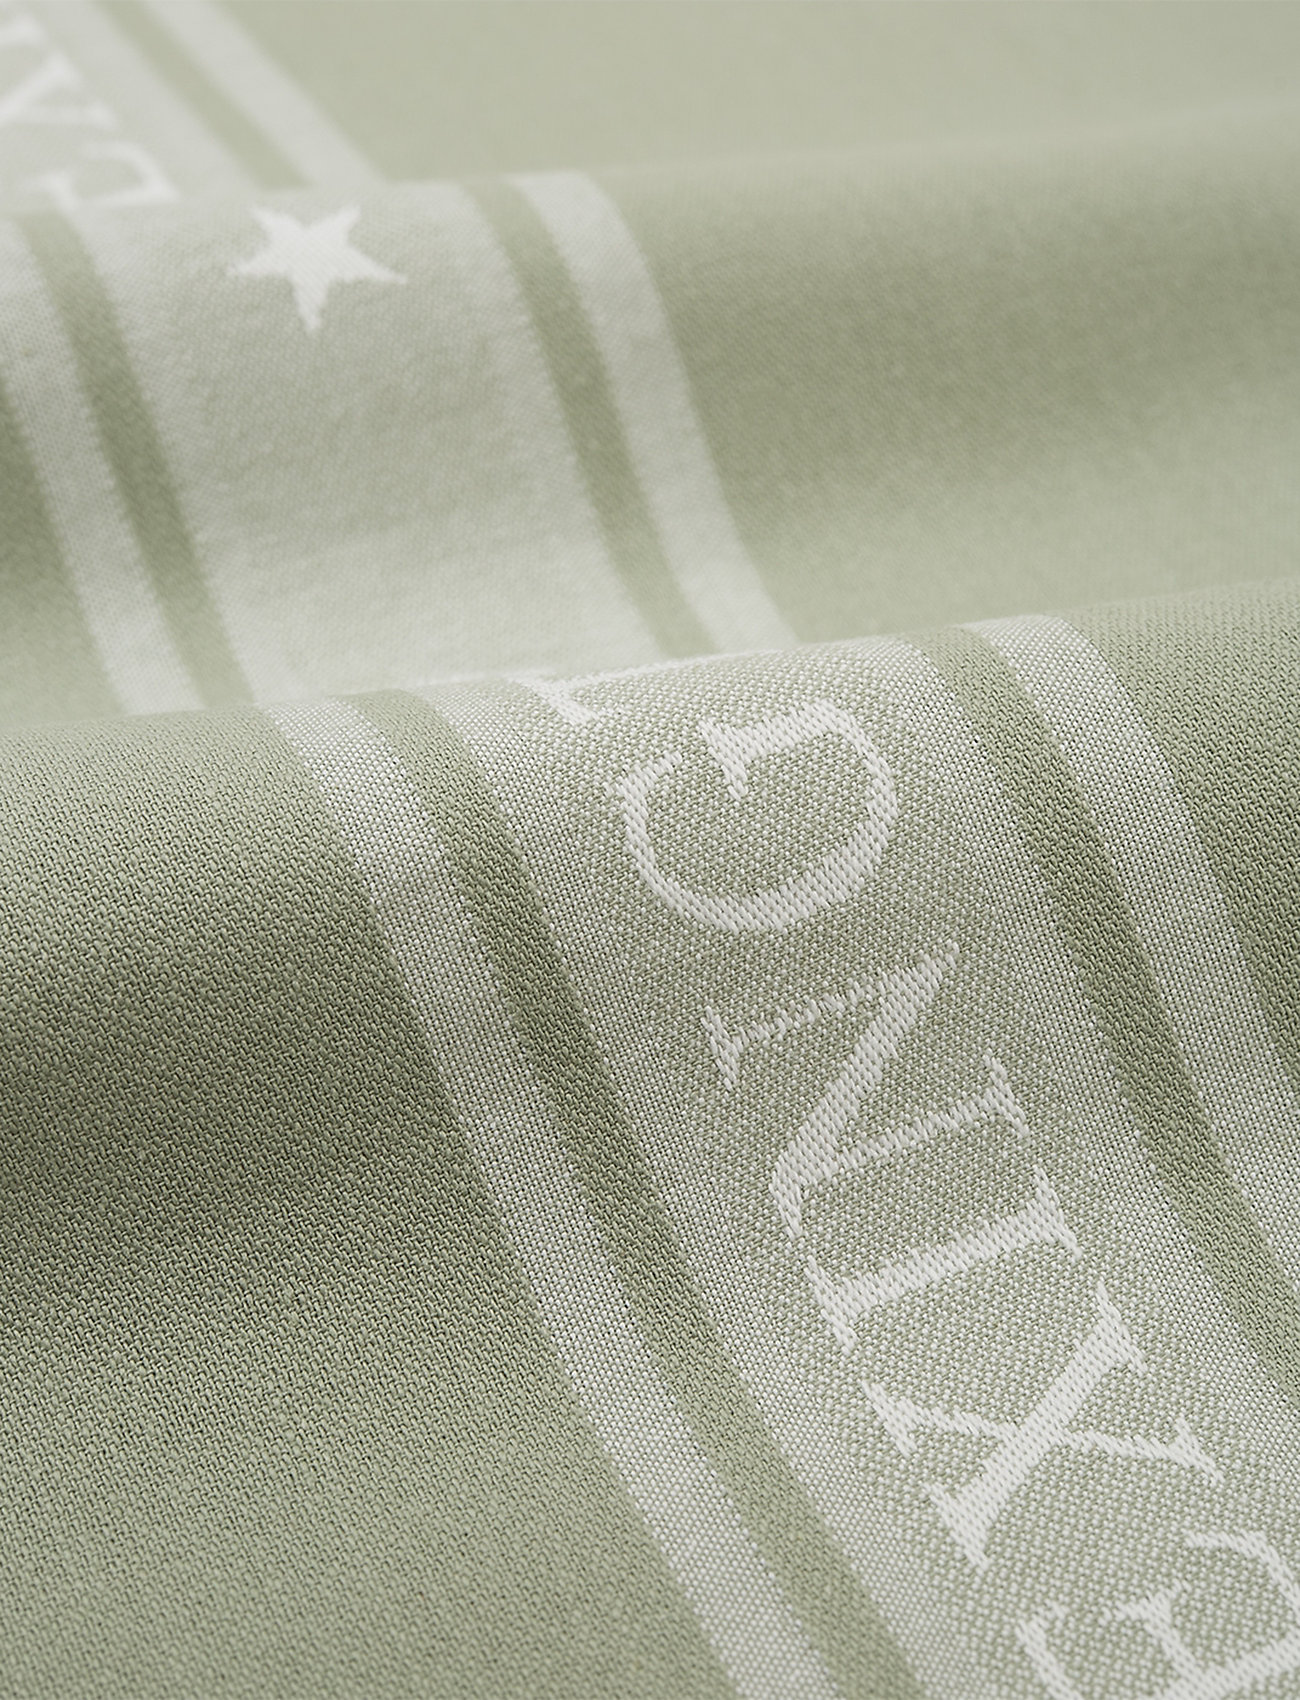 Lexington Home - Icons Cotton Jacquard Star Kitchen Towel - ręczniki kuchenne - sage green/white - 1